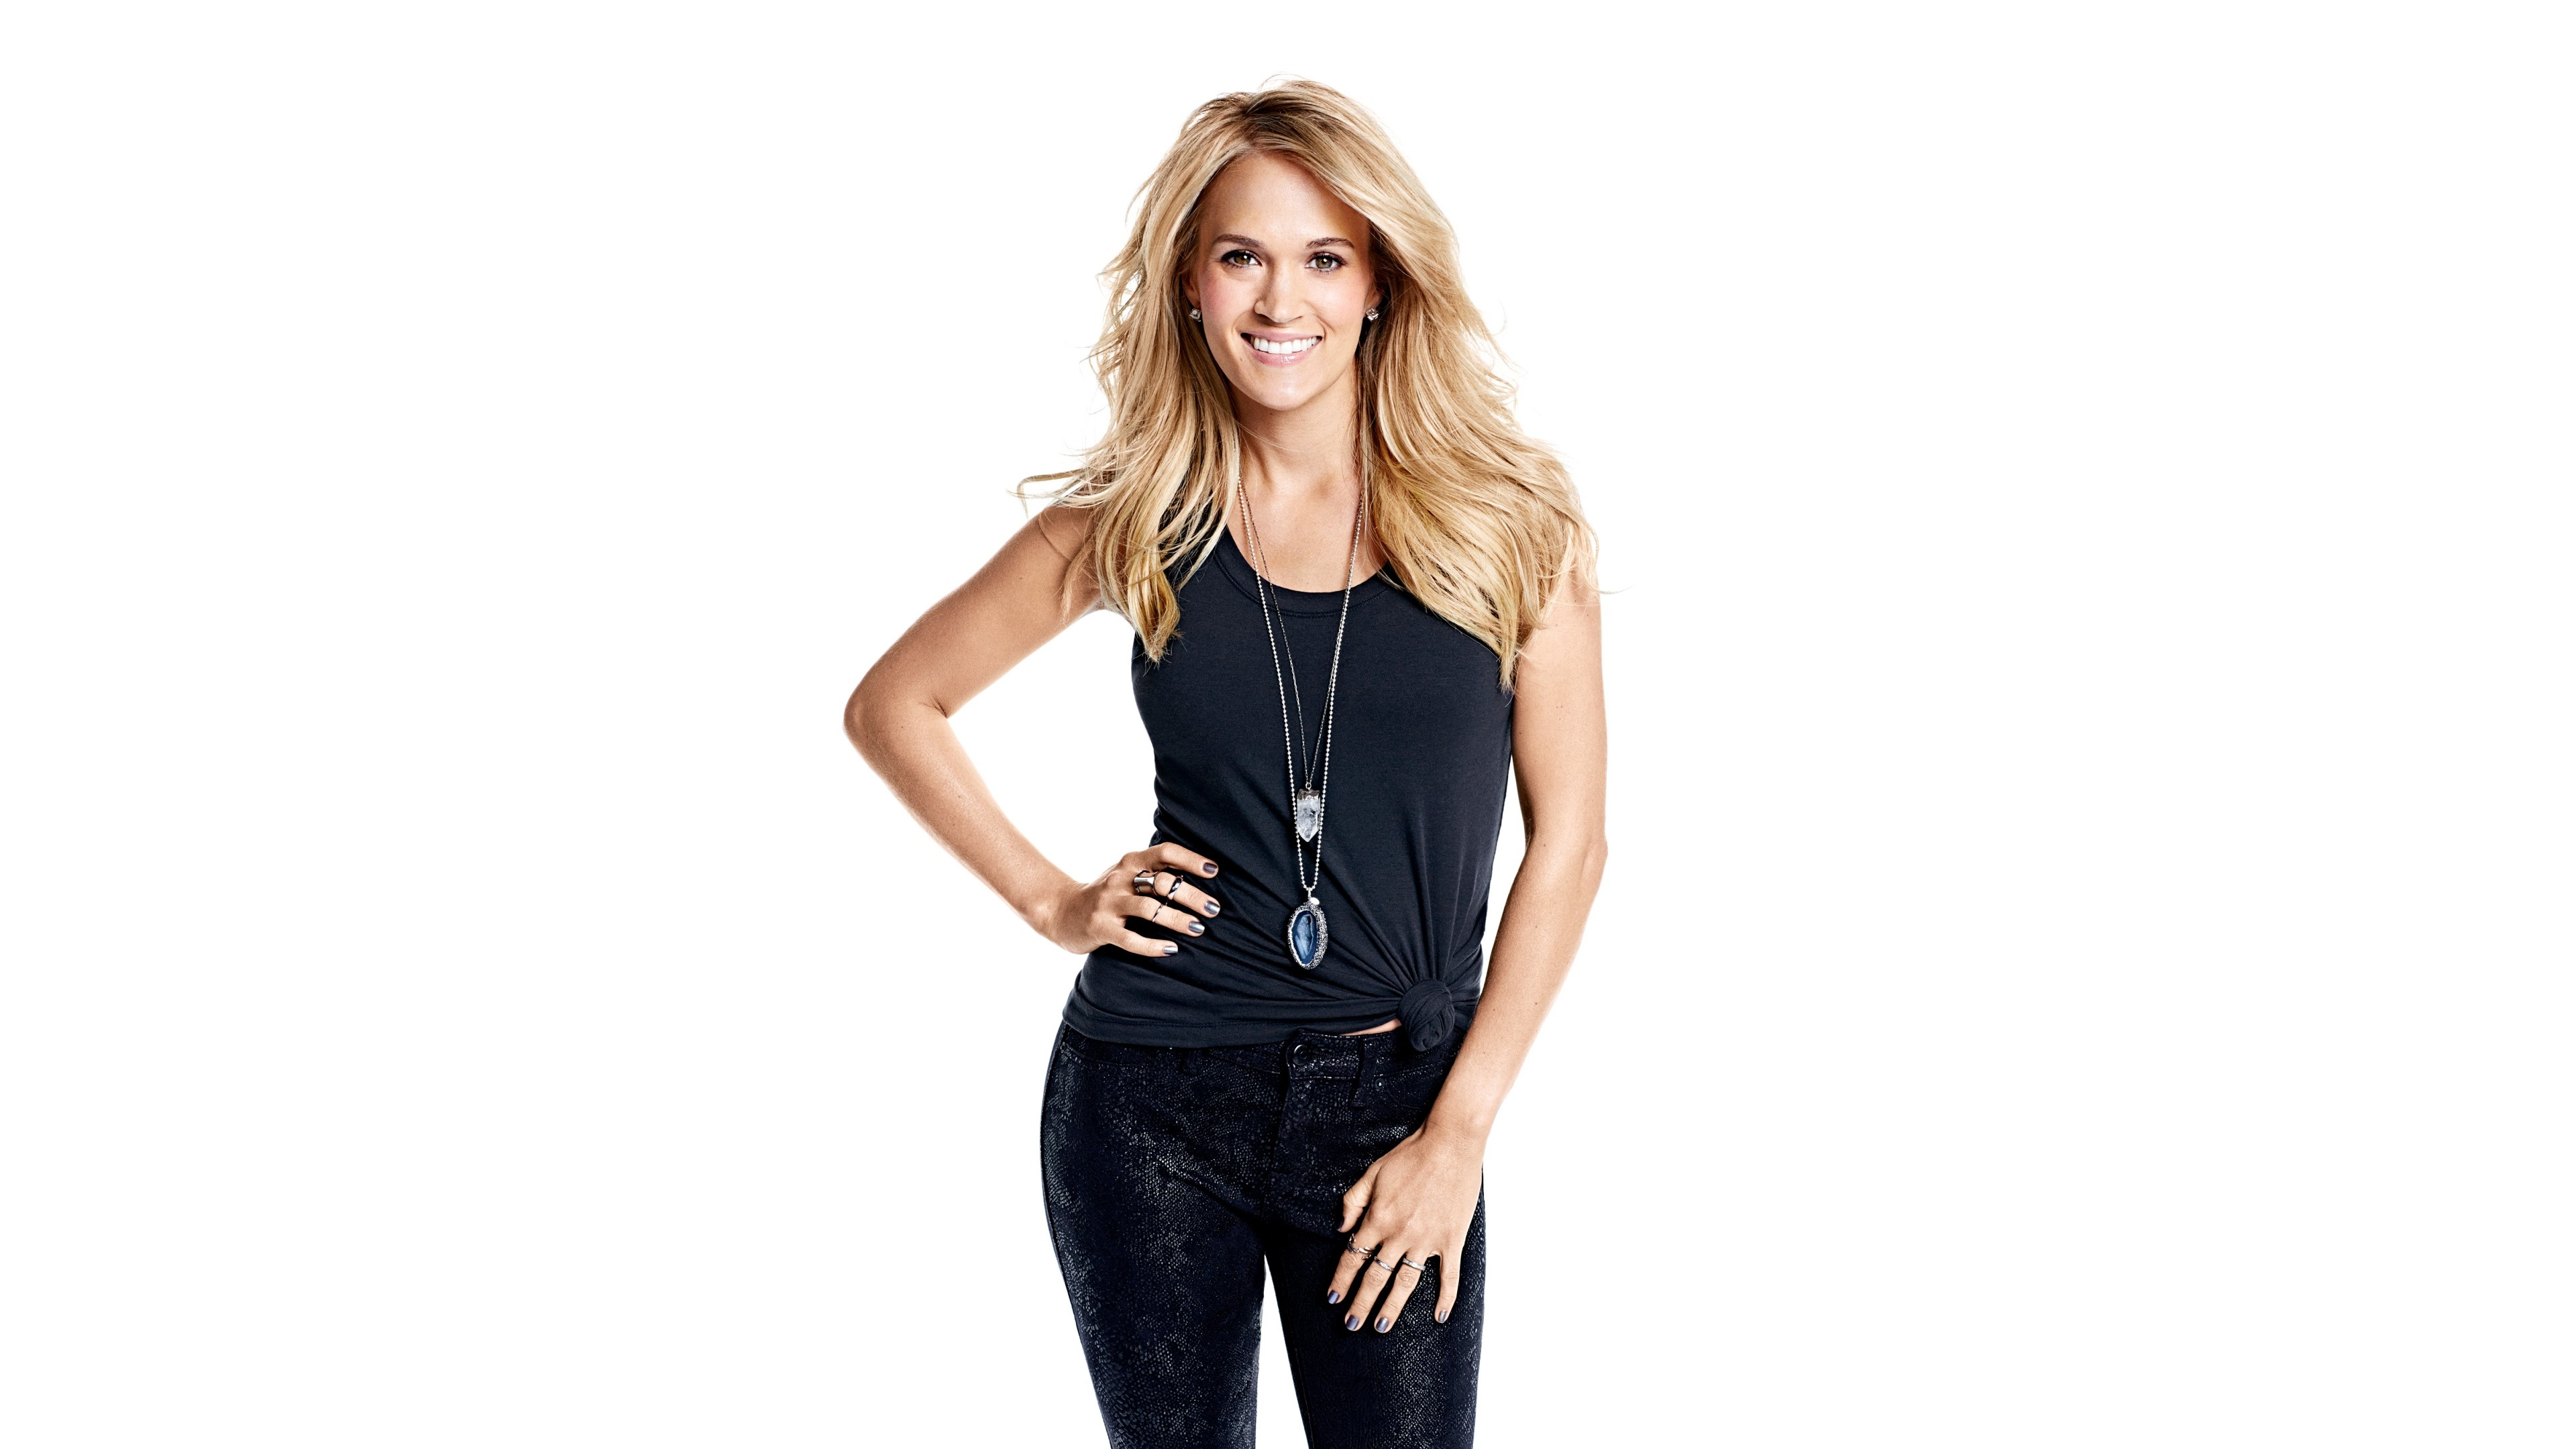 Fondos de pantalla Cantante Carrie Underwood